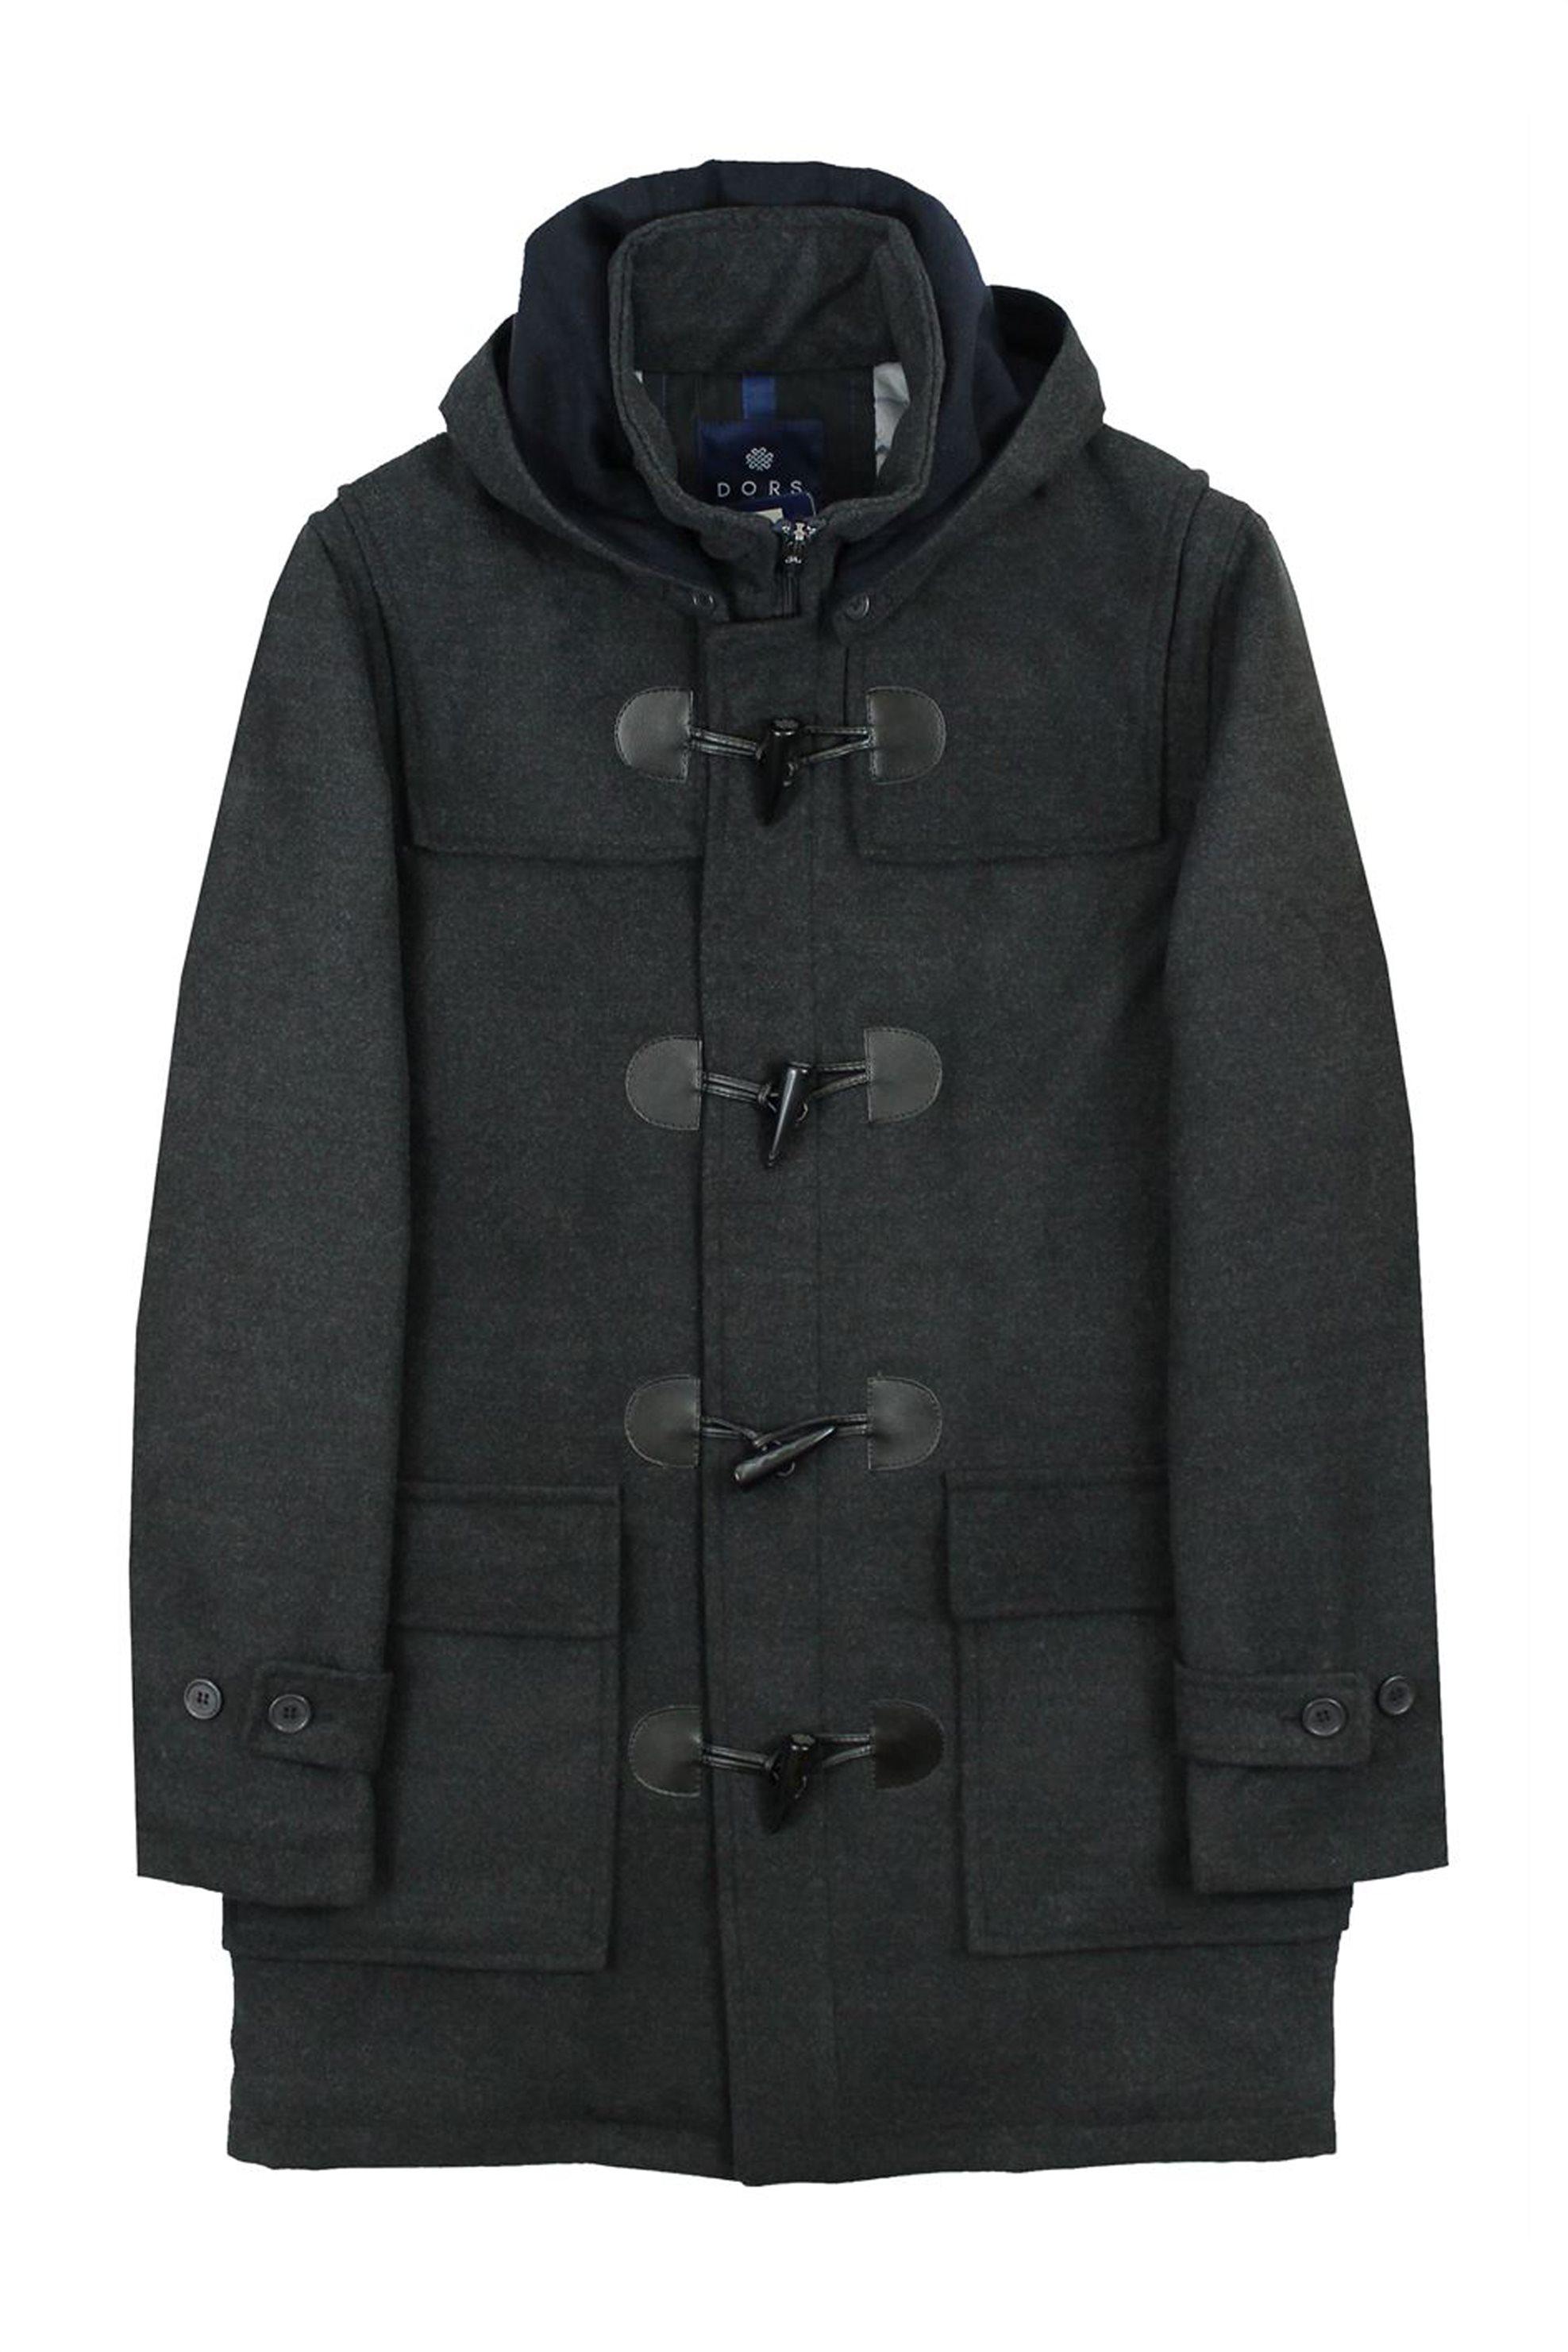 ba1931611543 Notos DORS ανδρικό μάλλινο παλτό μοντγκόμερι - 3325004.C2 - Ανθρακί